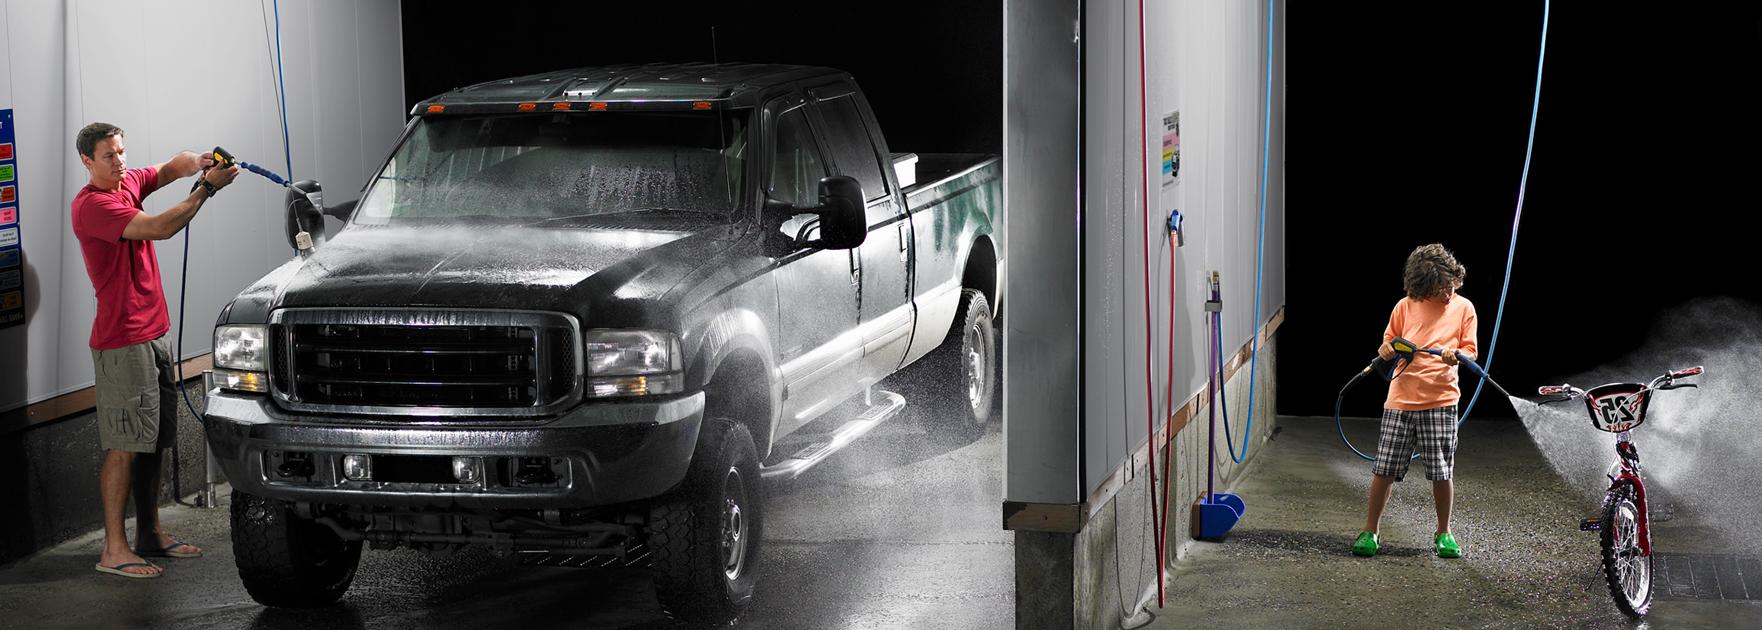 MyGuy, Inc  | Car Wash Supplies & Equipment | Southern Minnesota